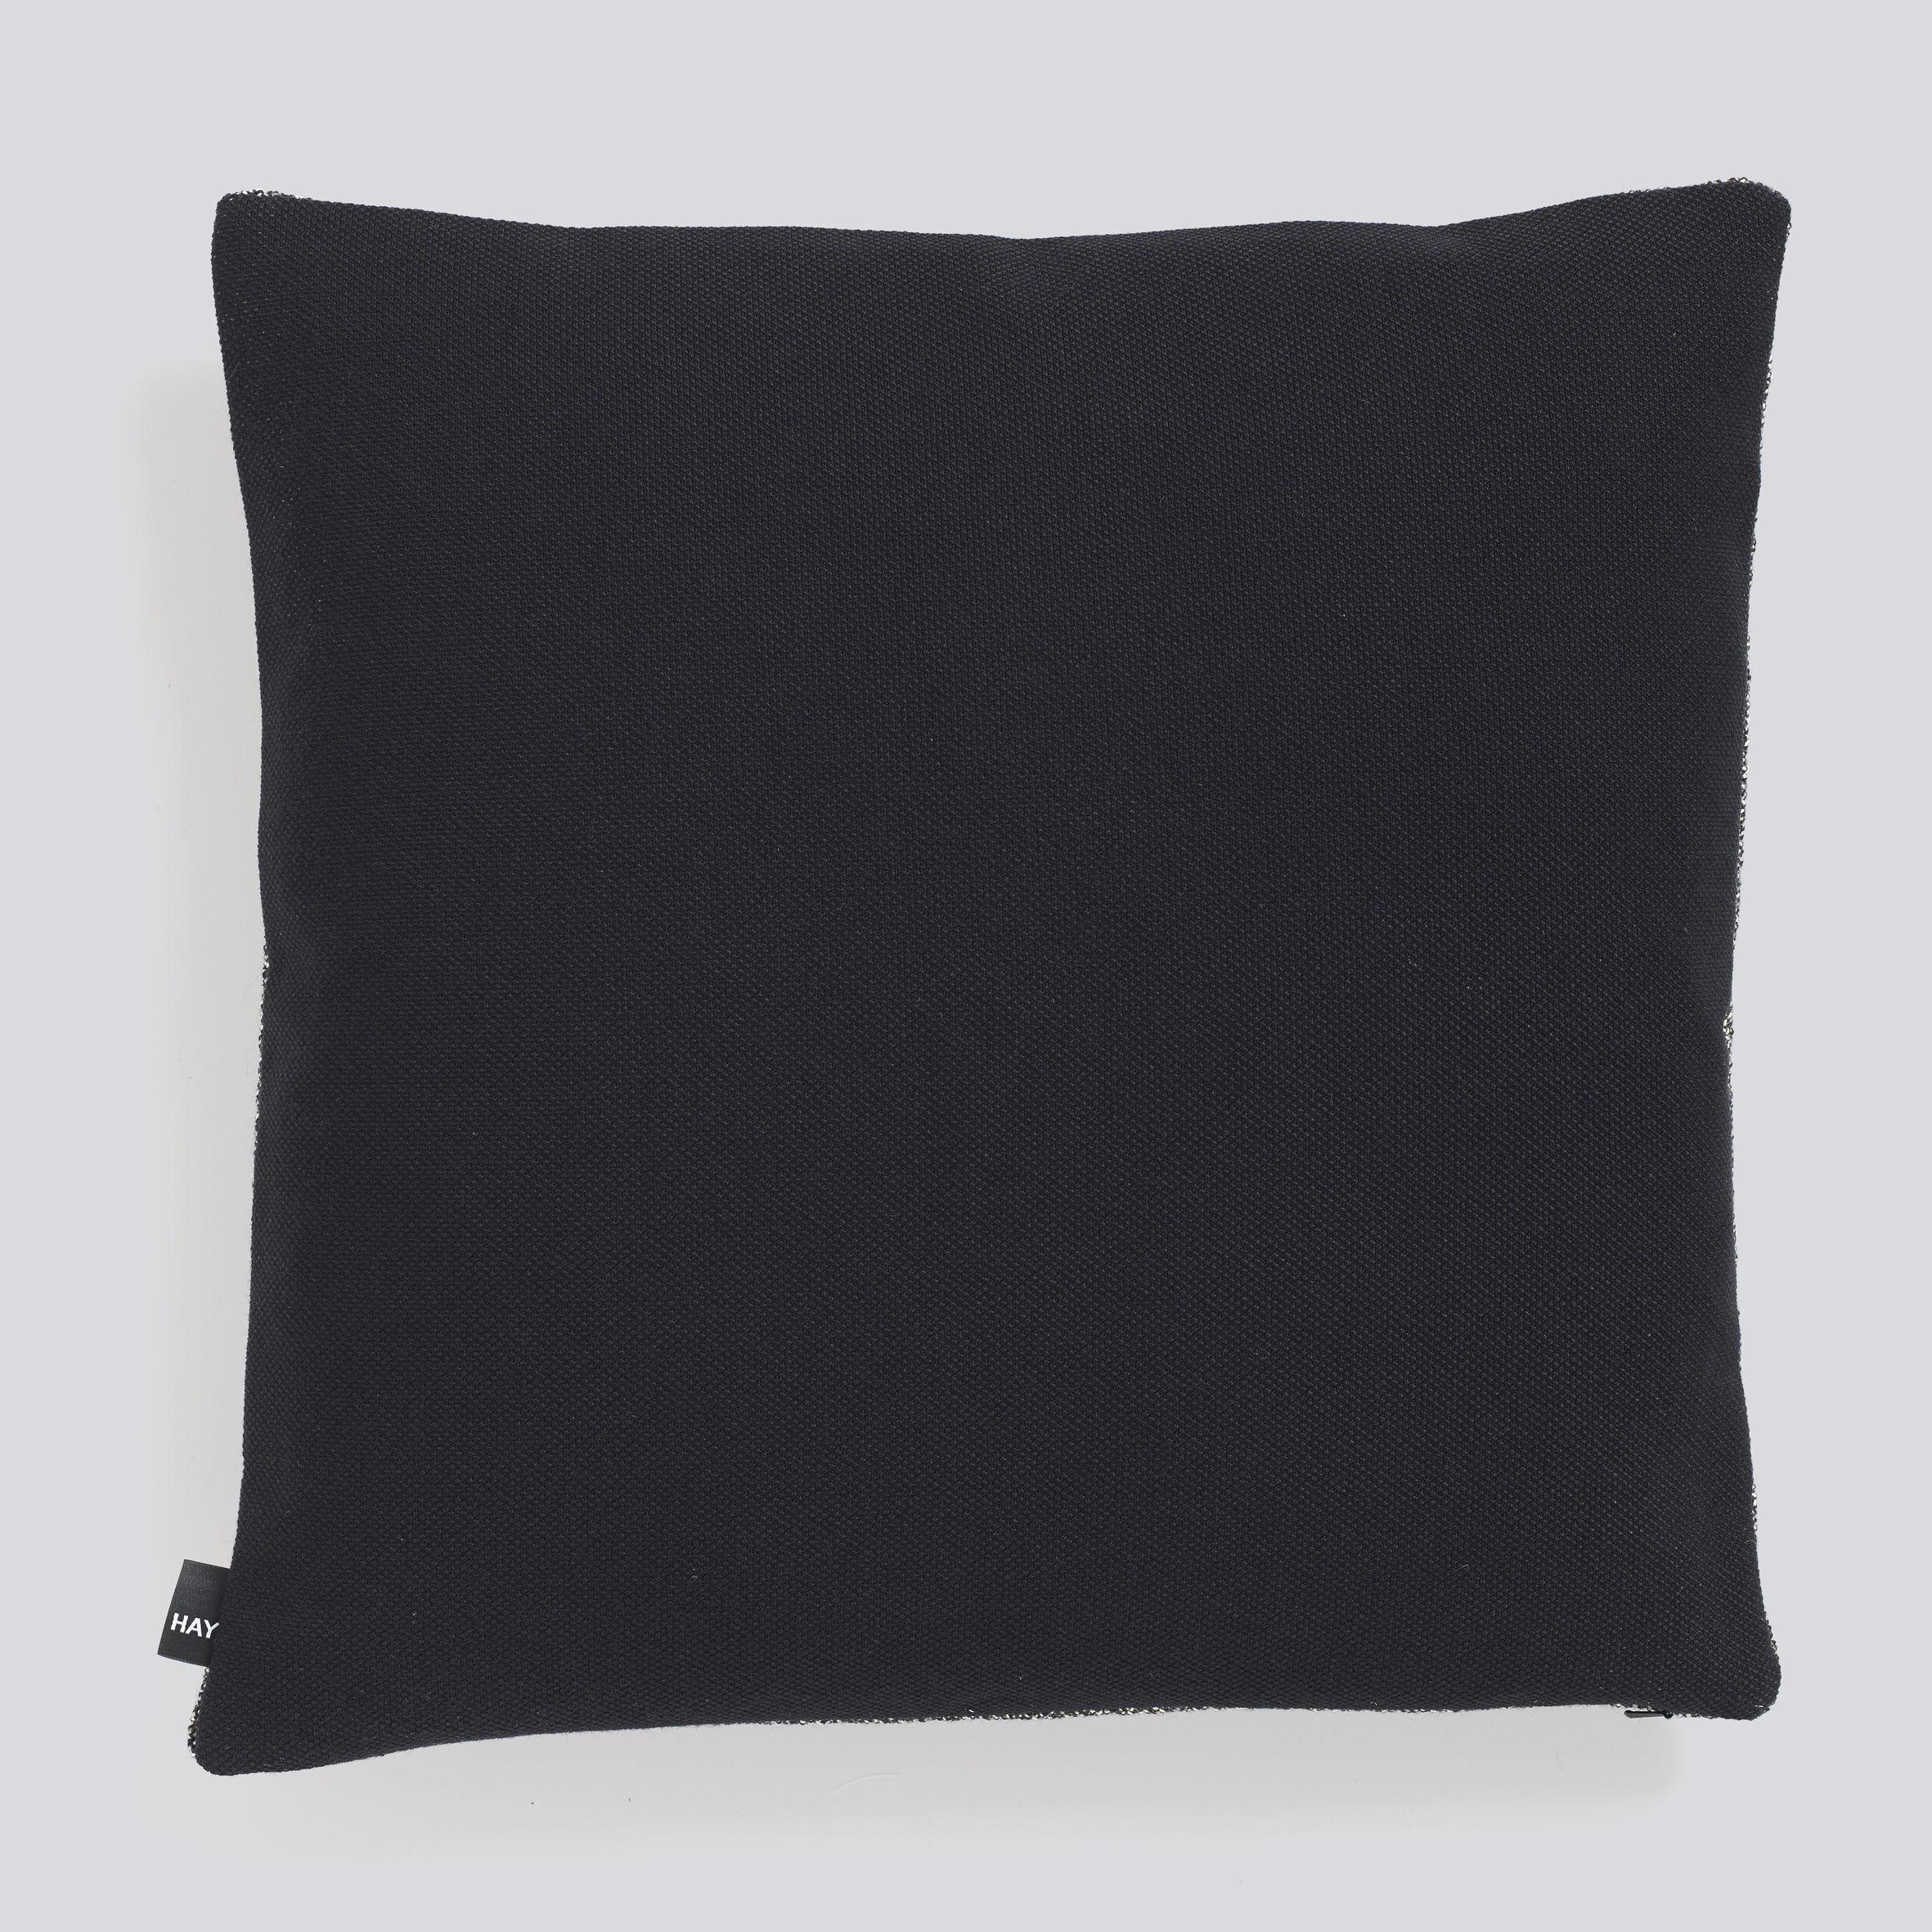 coussin eclectic 50 x 50 cm sel poivre hay. Black Bedroom Furniture Sets. Home Design Ideas